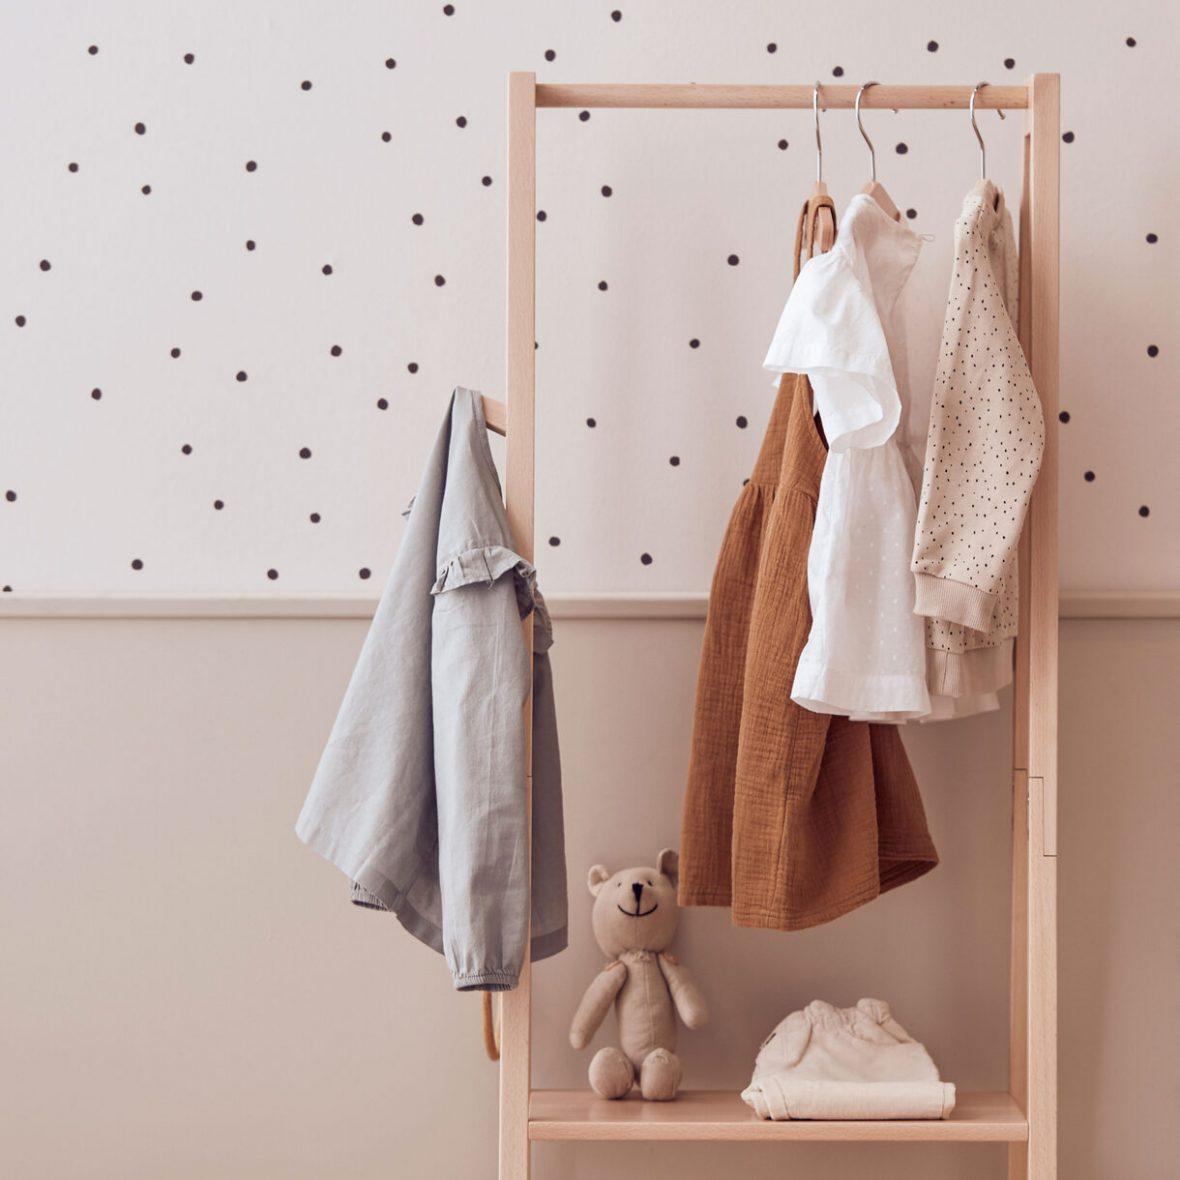 Clothing-rack-SAGA-Blonde-1000584-Adjustable-stool-SS21-E_1